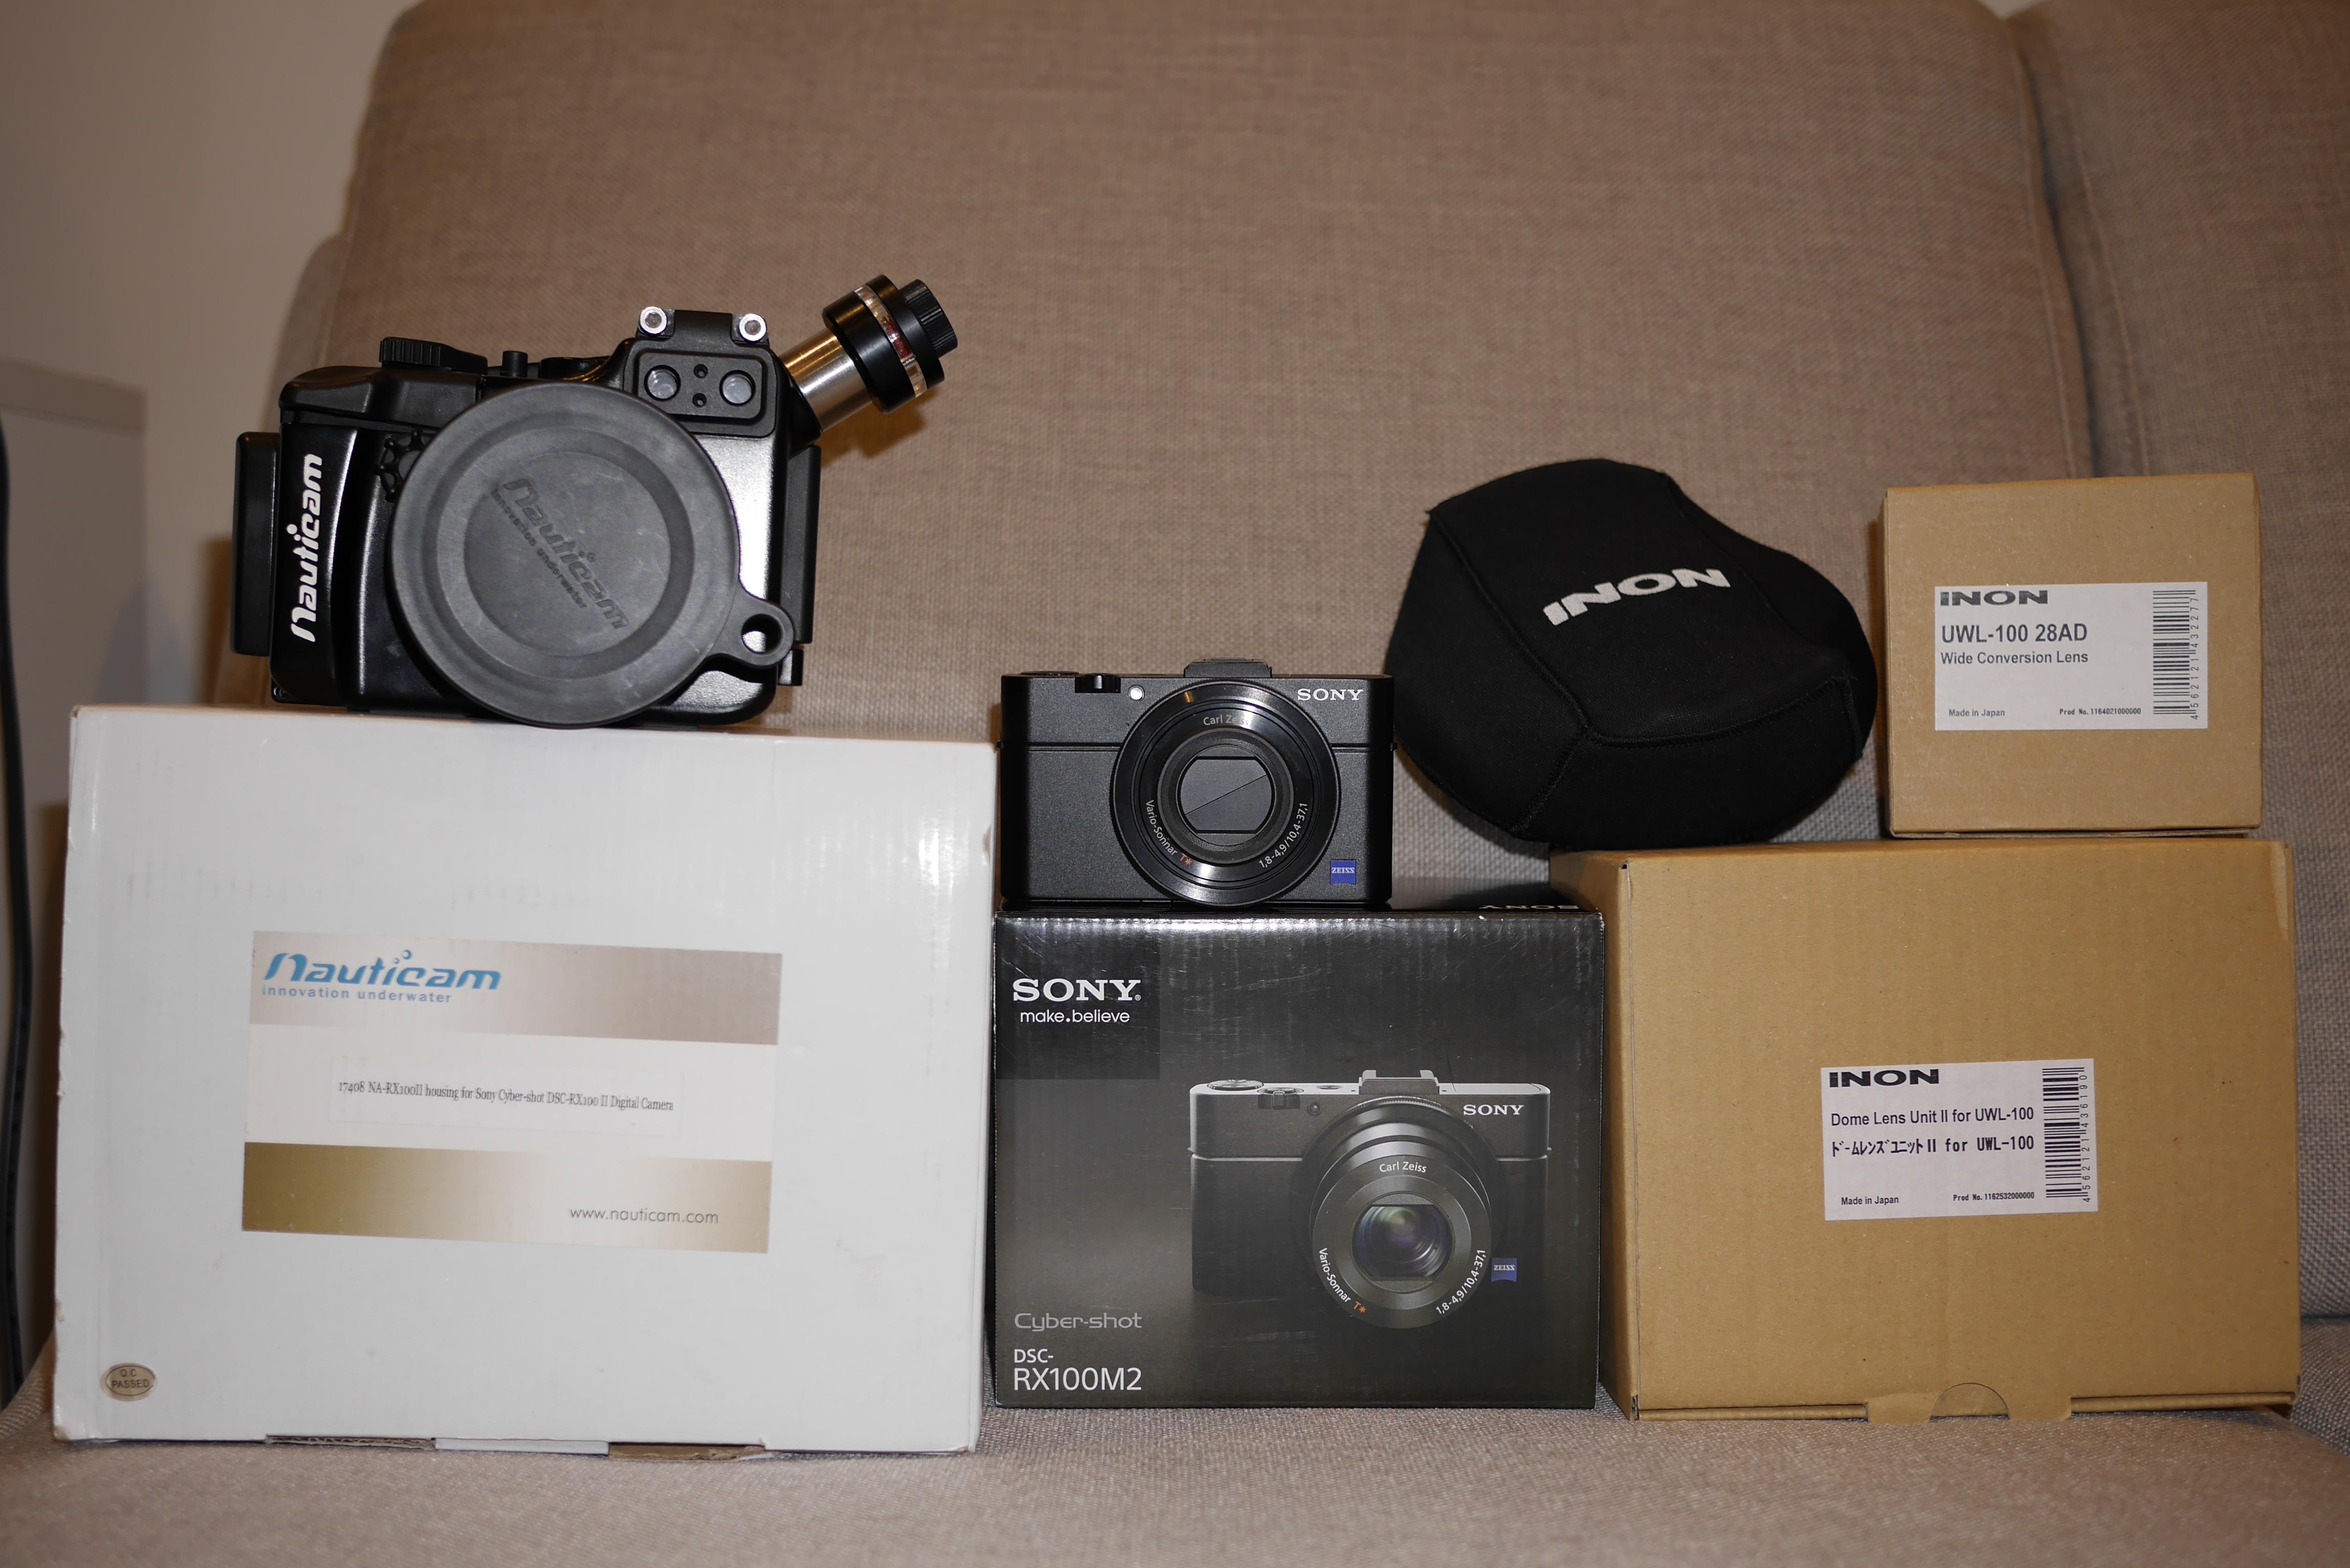 Sony RX100 Mark II with Inon UWL-100 28AD + Dome